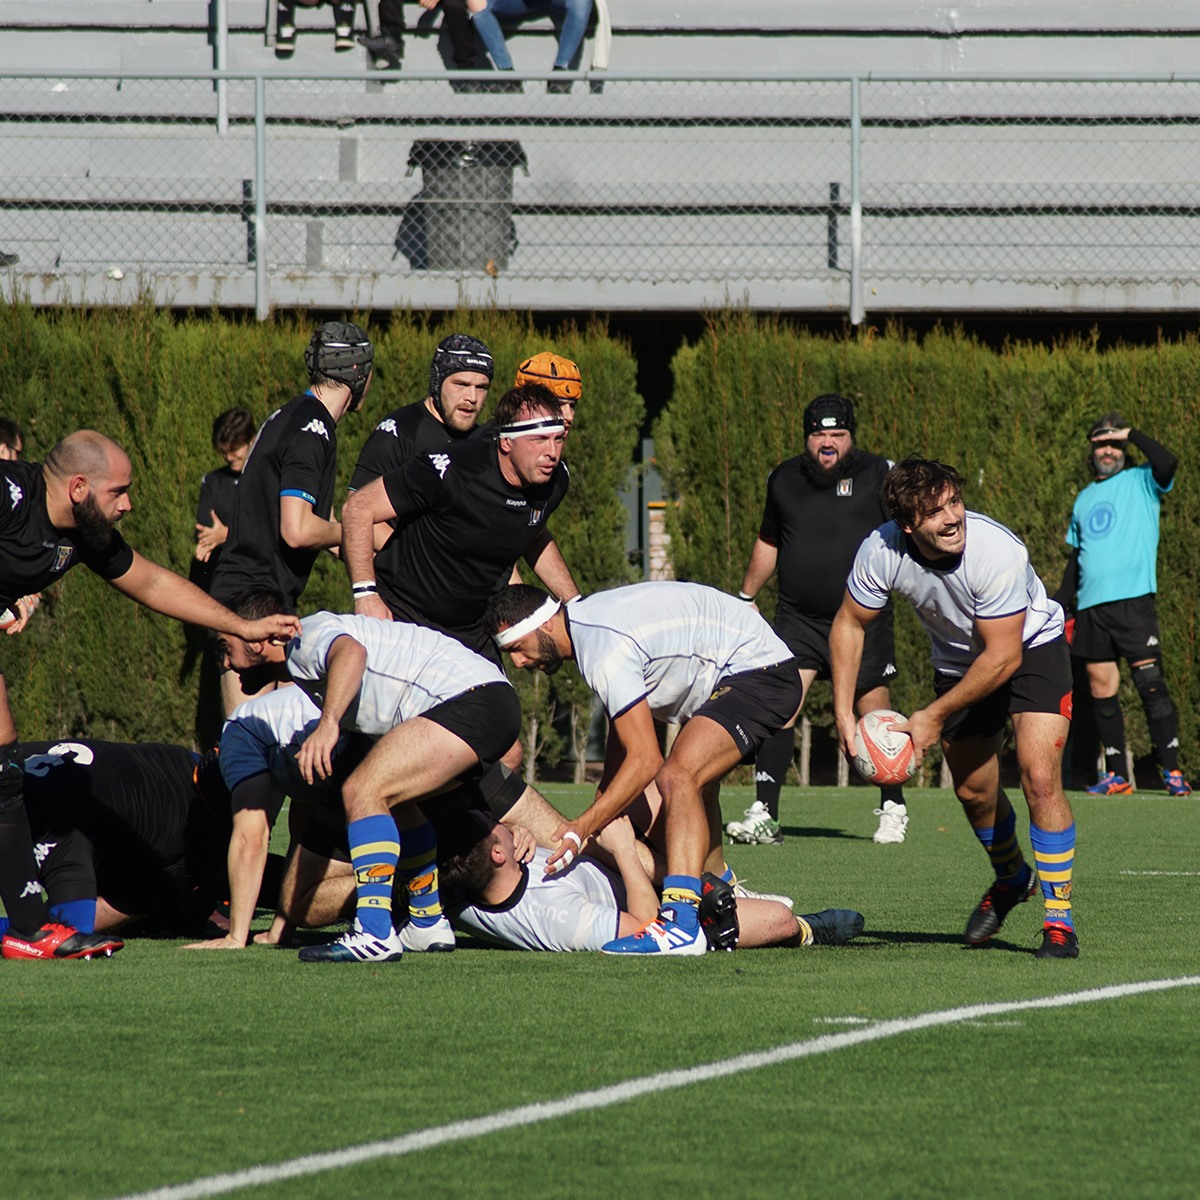 cruc senior castelldefels rugby